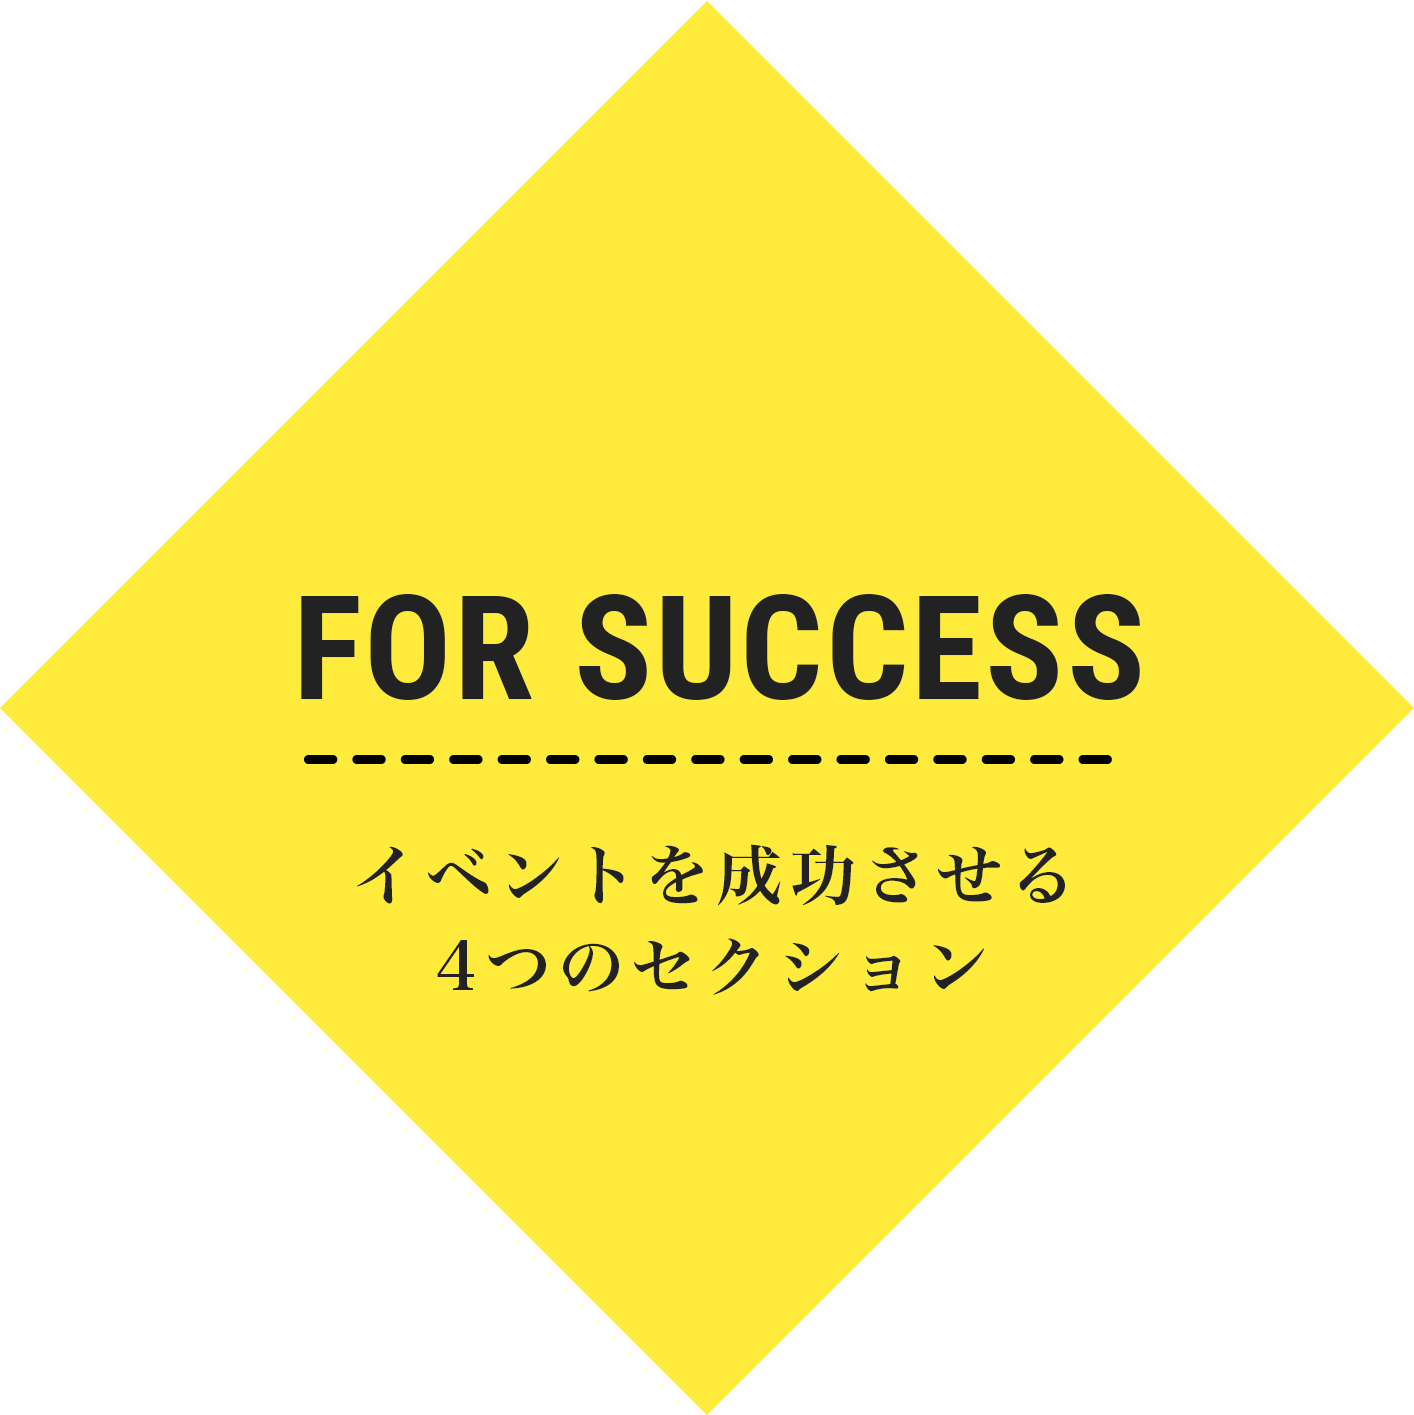 FOR SUCCESS イベントを成功させる4つのセクション